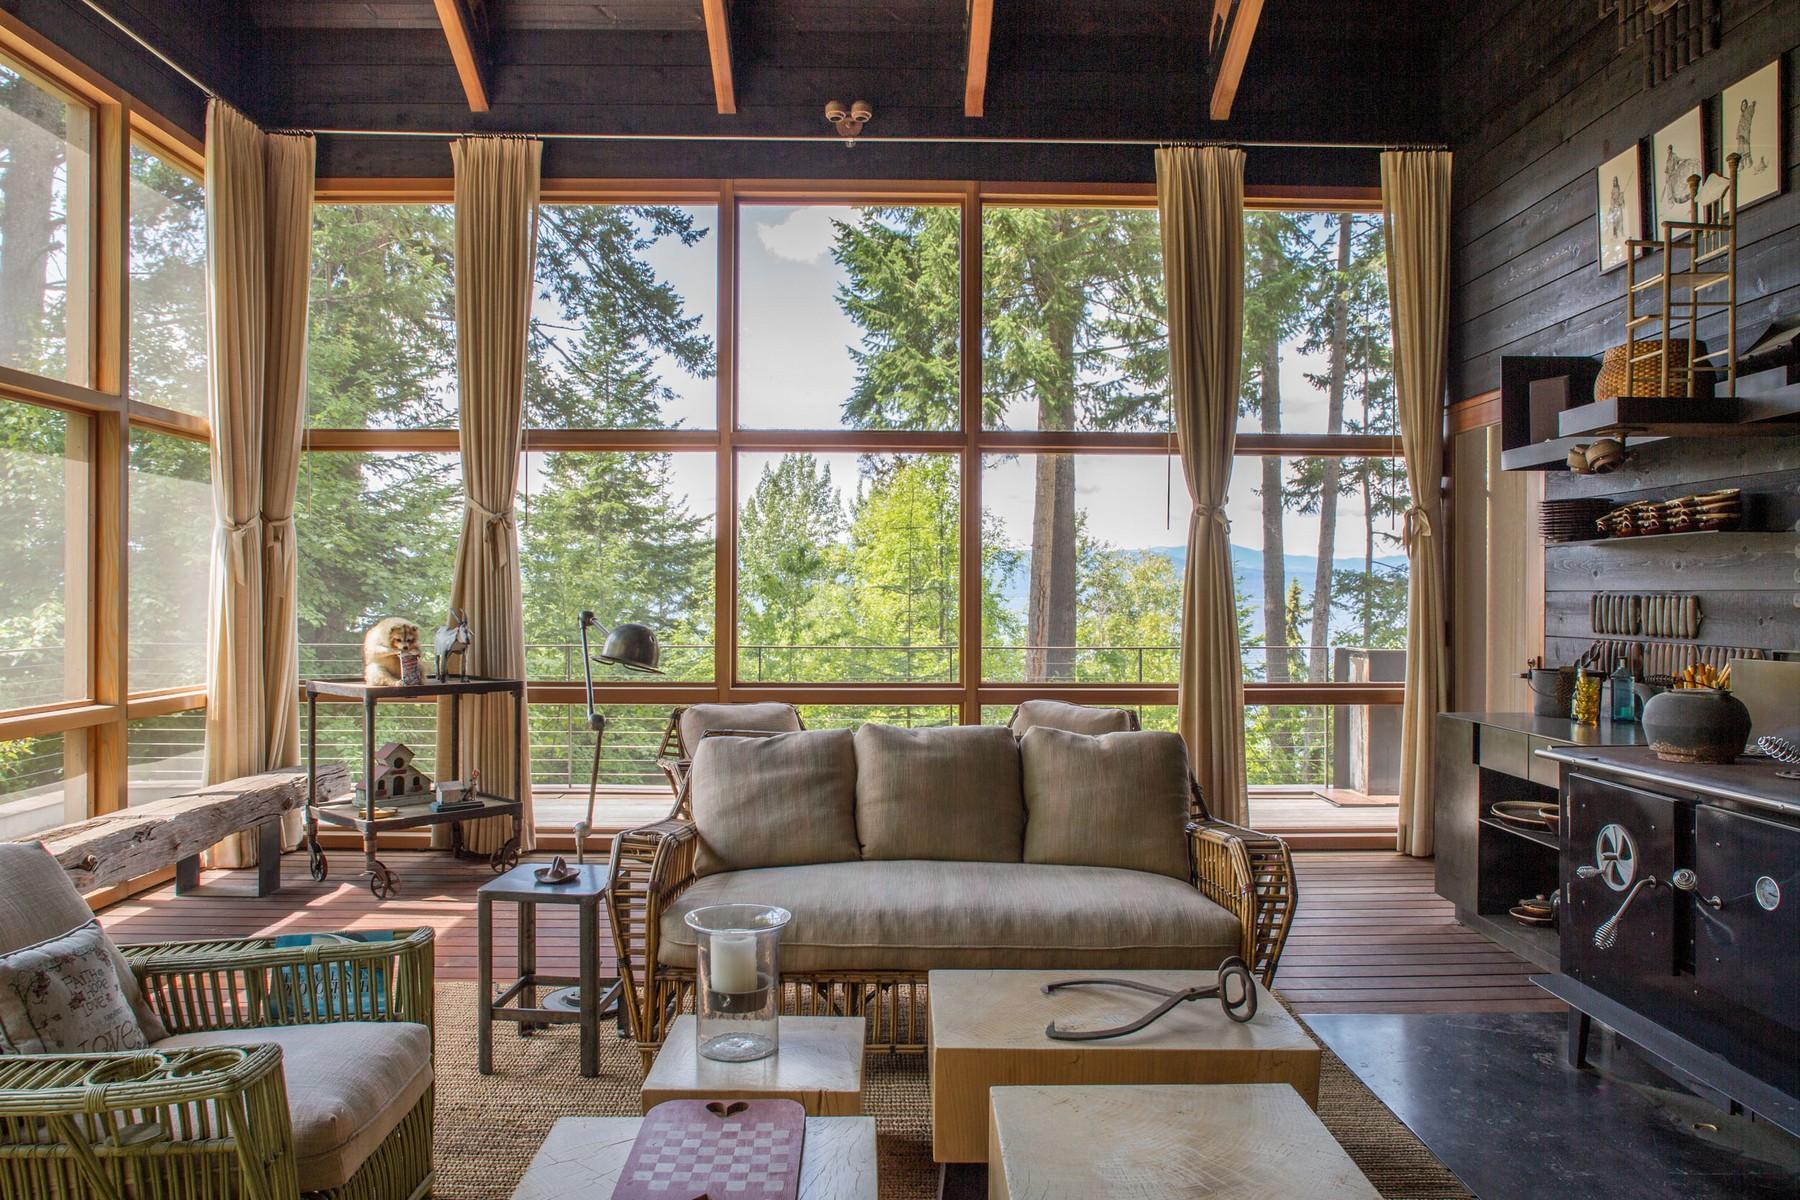 52.Lodge Sitting Room2 view (1)